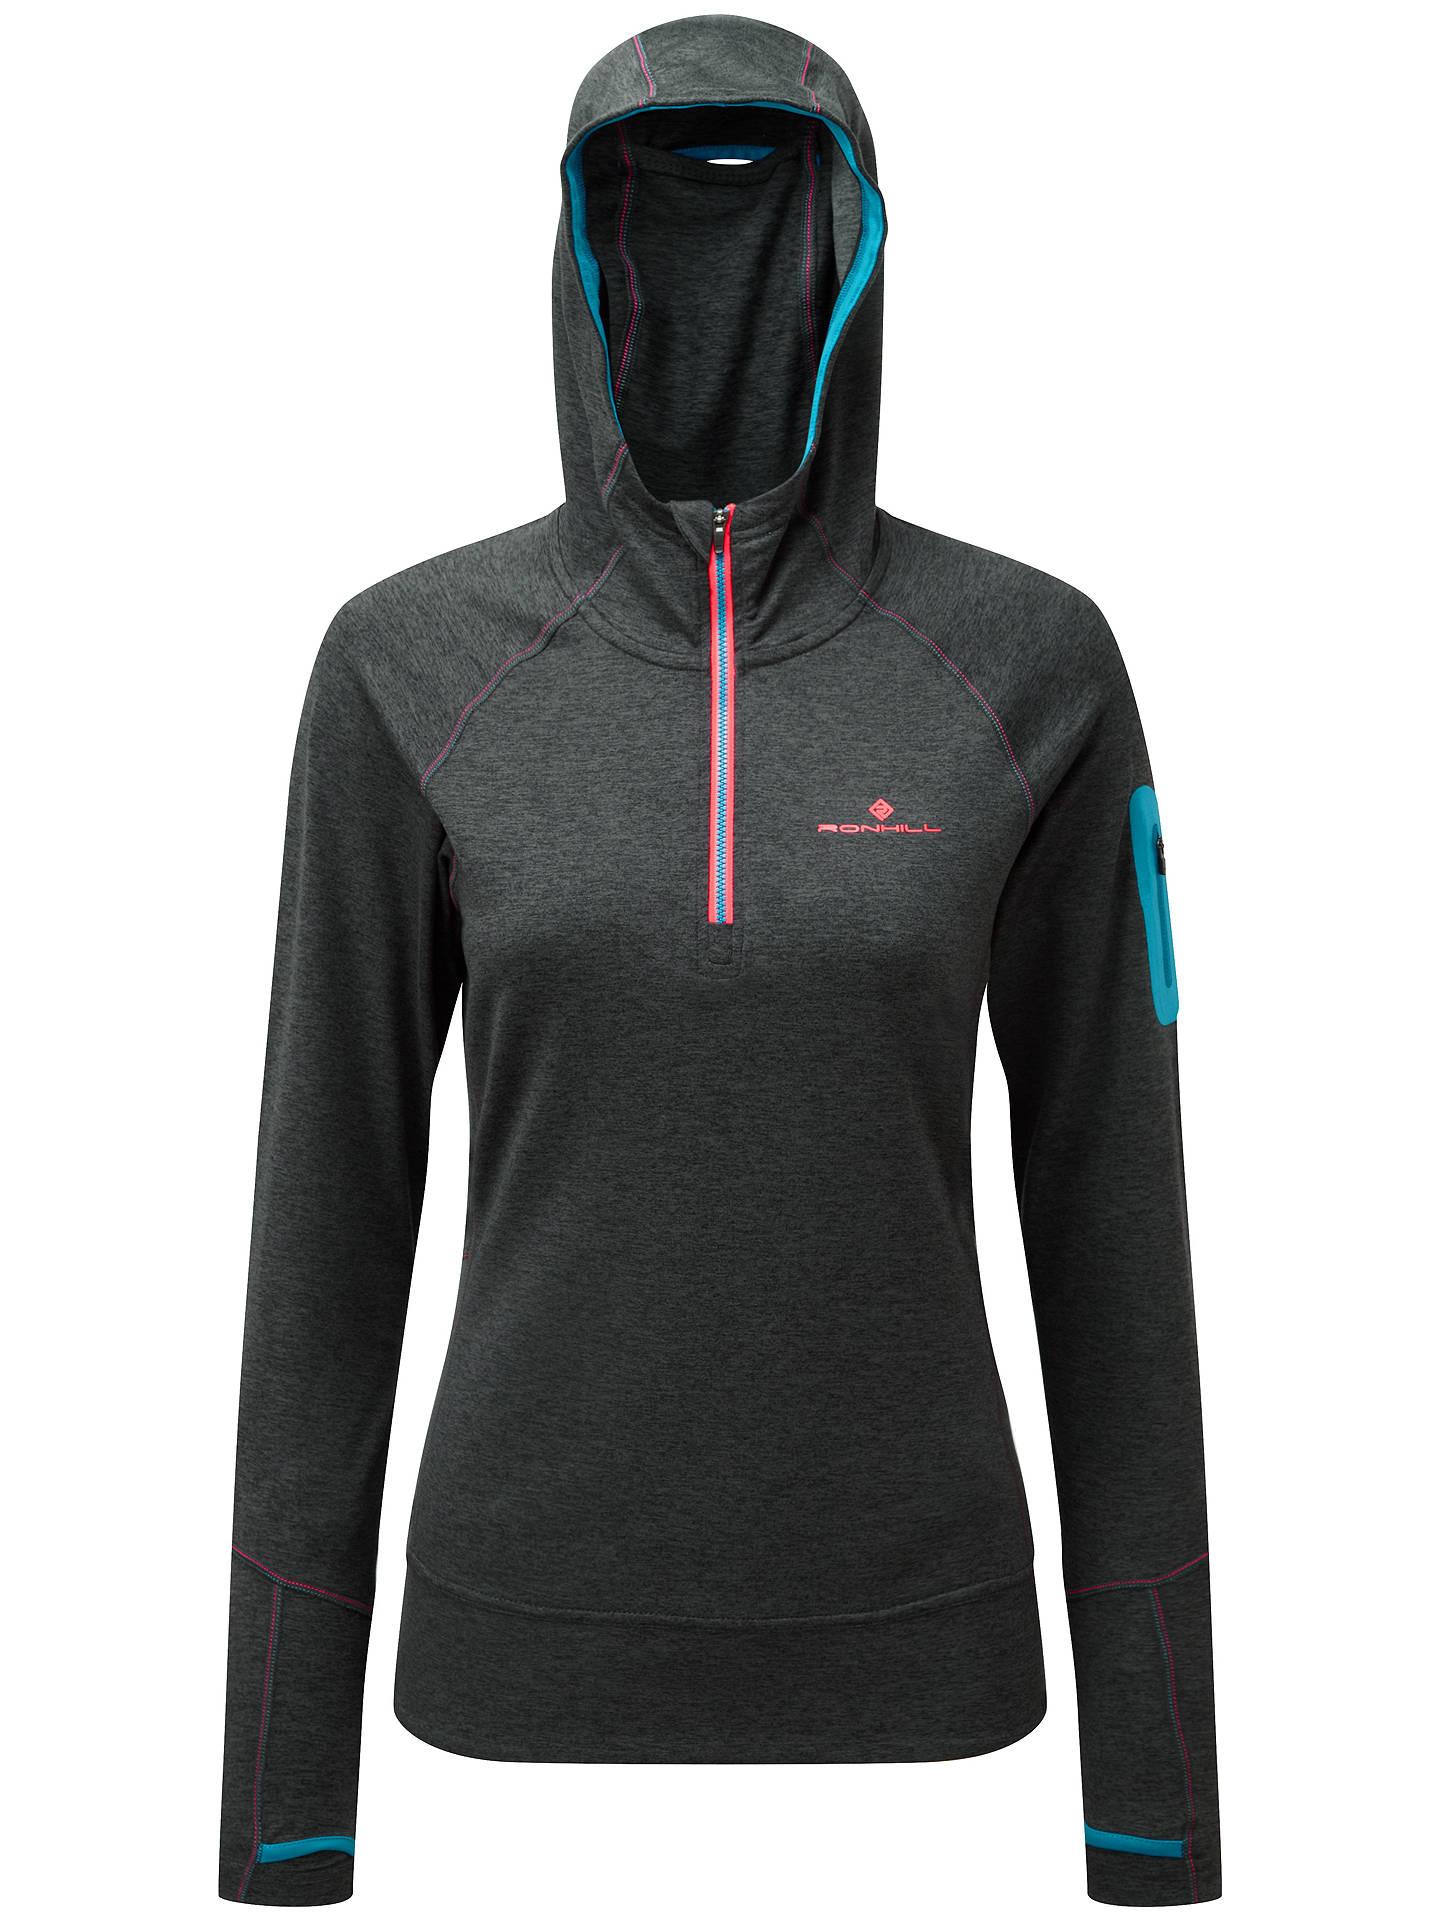 Damen-Sportbekleidung Sportshirt Ron Hill Victory Running Hoody Womens Grey/Blue Jogging Hoodie Shirt Fitness